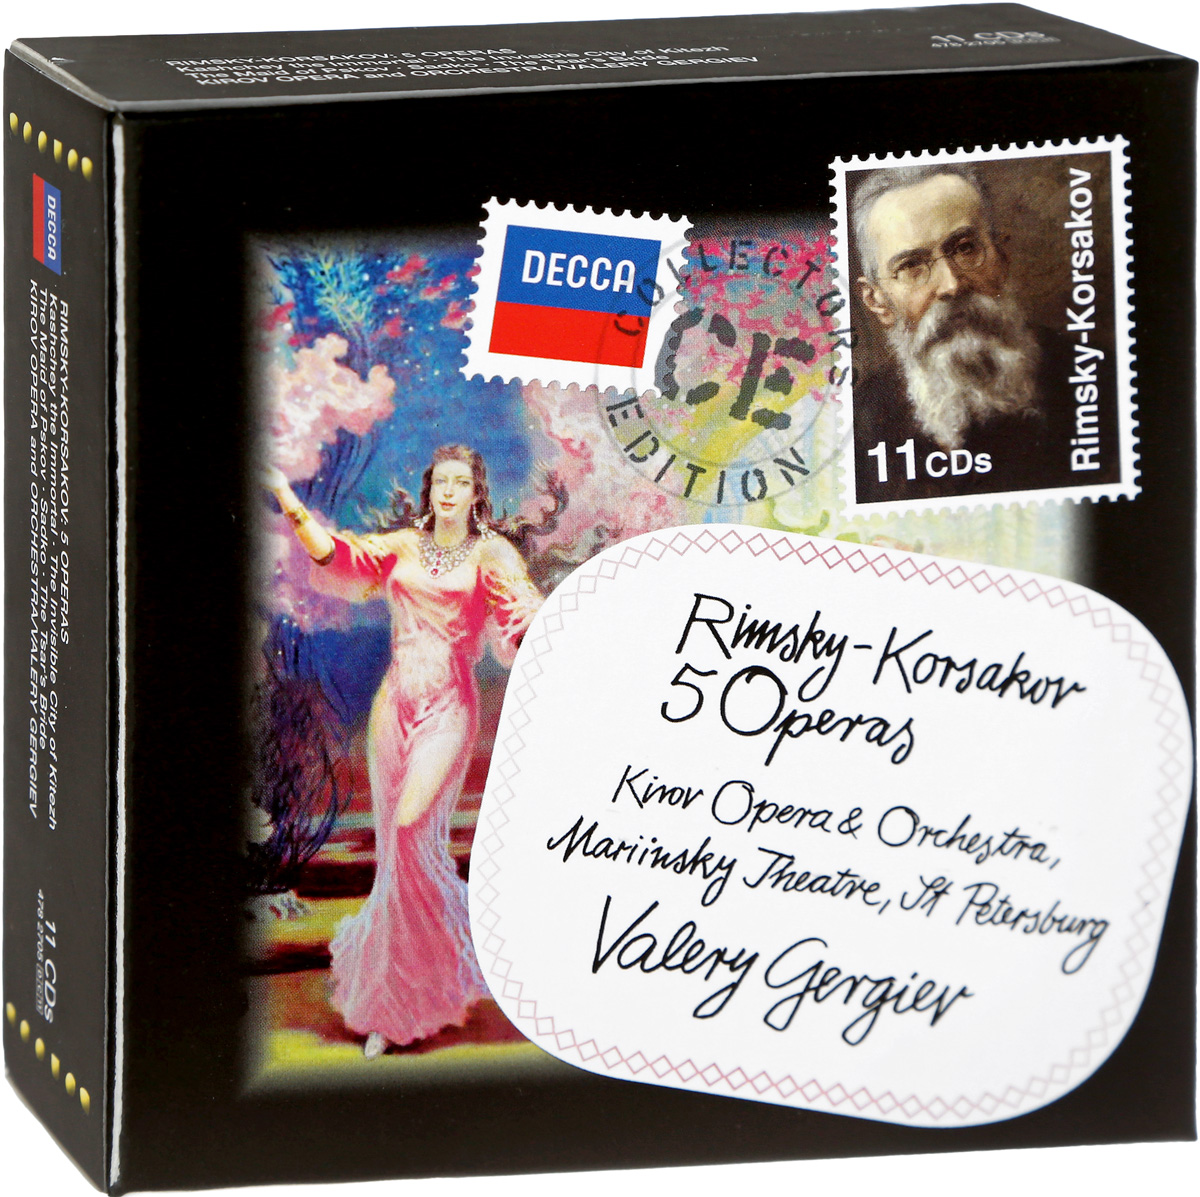 Валерий Гергиев Valery Gergiev. Rimsky-Korsakov Operas (11 CD) утюг 4919